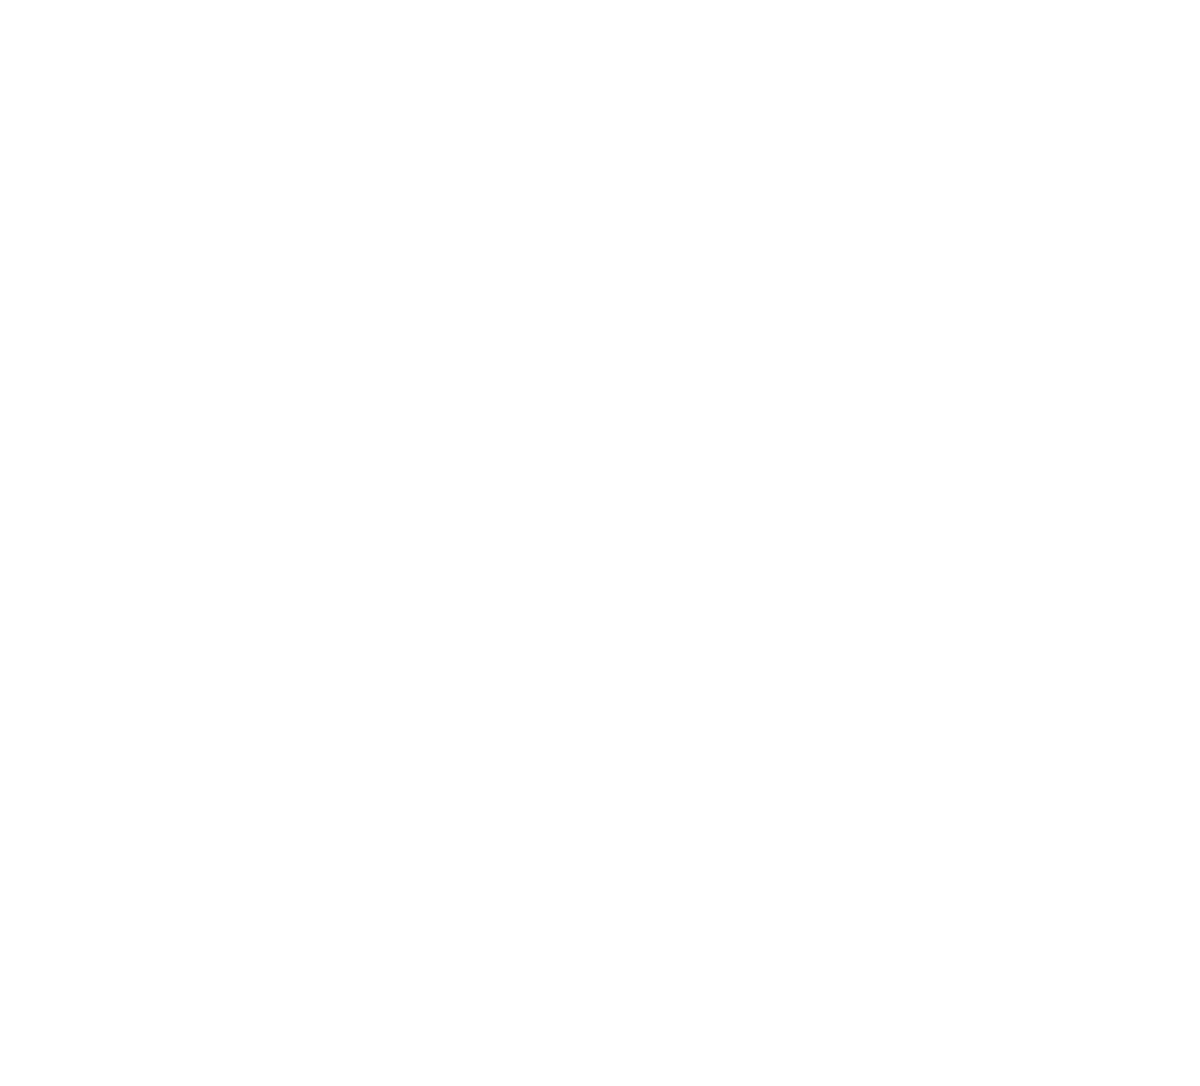 December 2021 New York City. December 2-5th. December 9-12th. The Market Line, 180 Broome St, NY